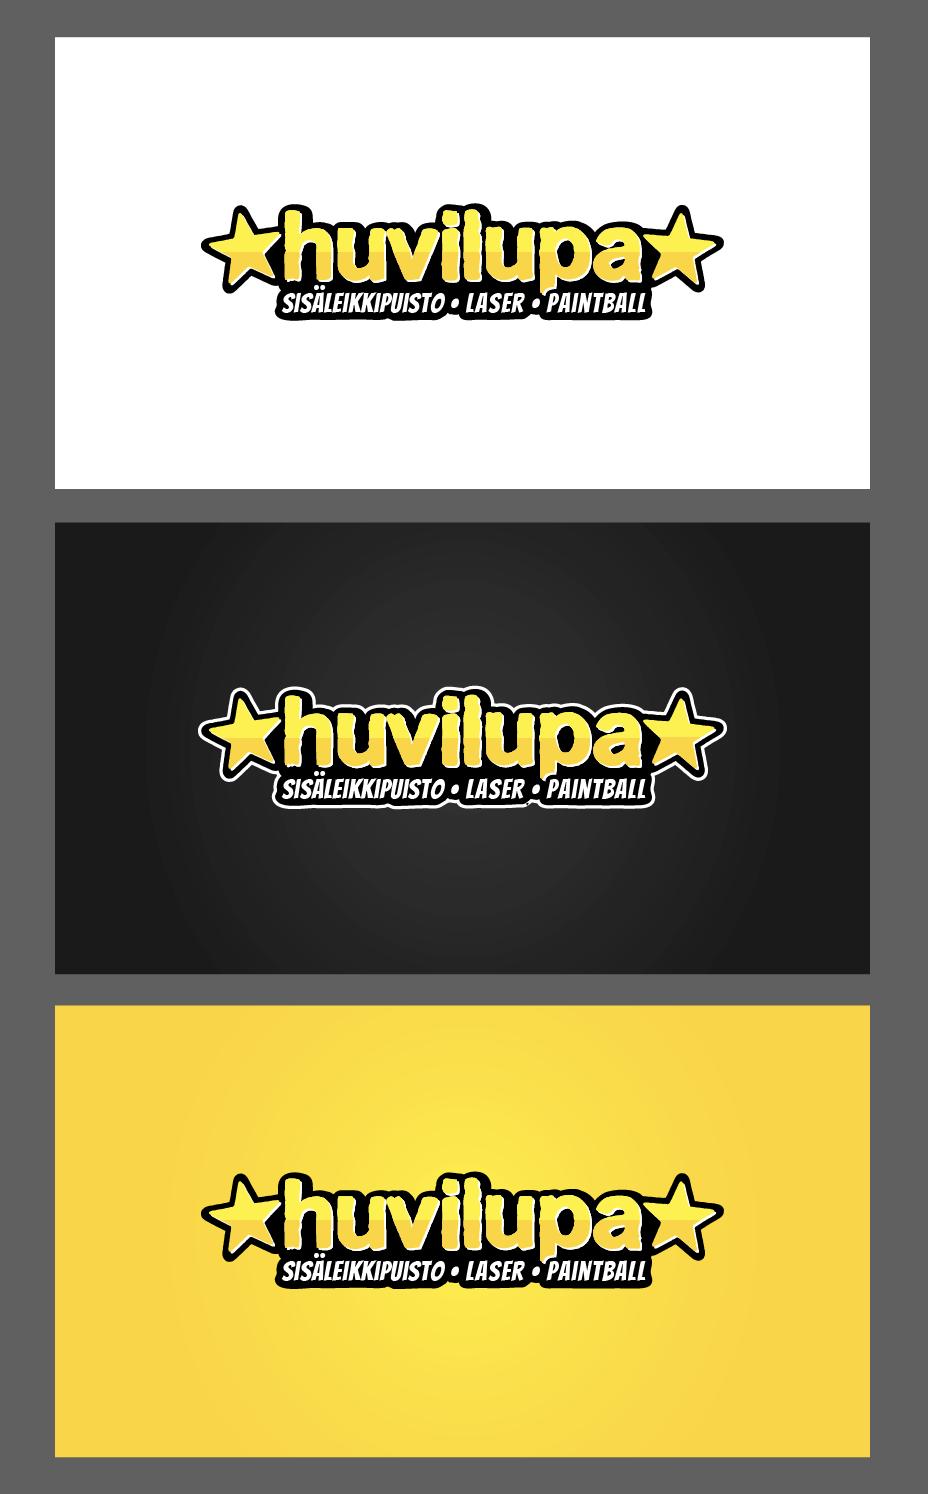 Suomen Huvilupa Oy logo